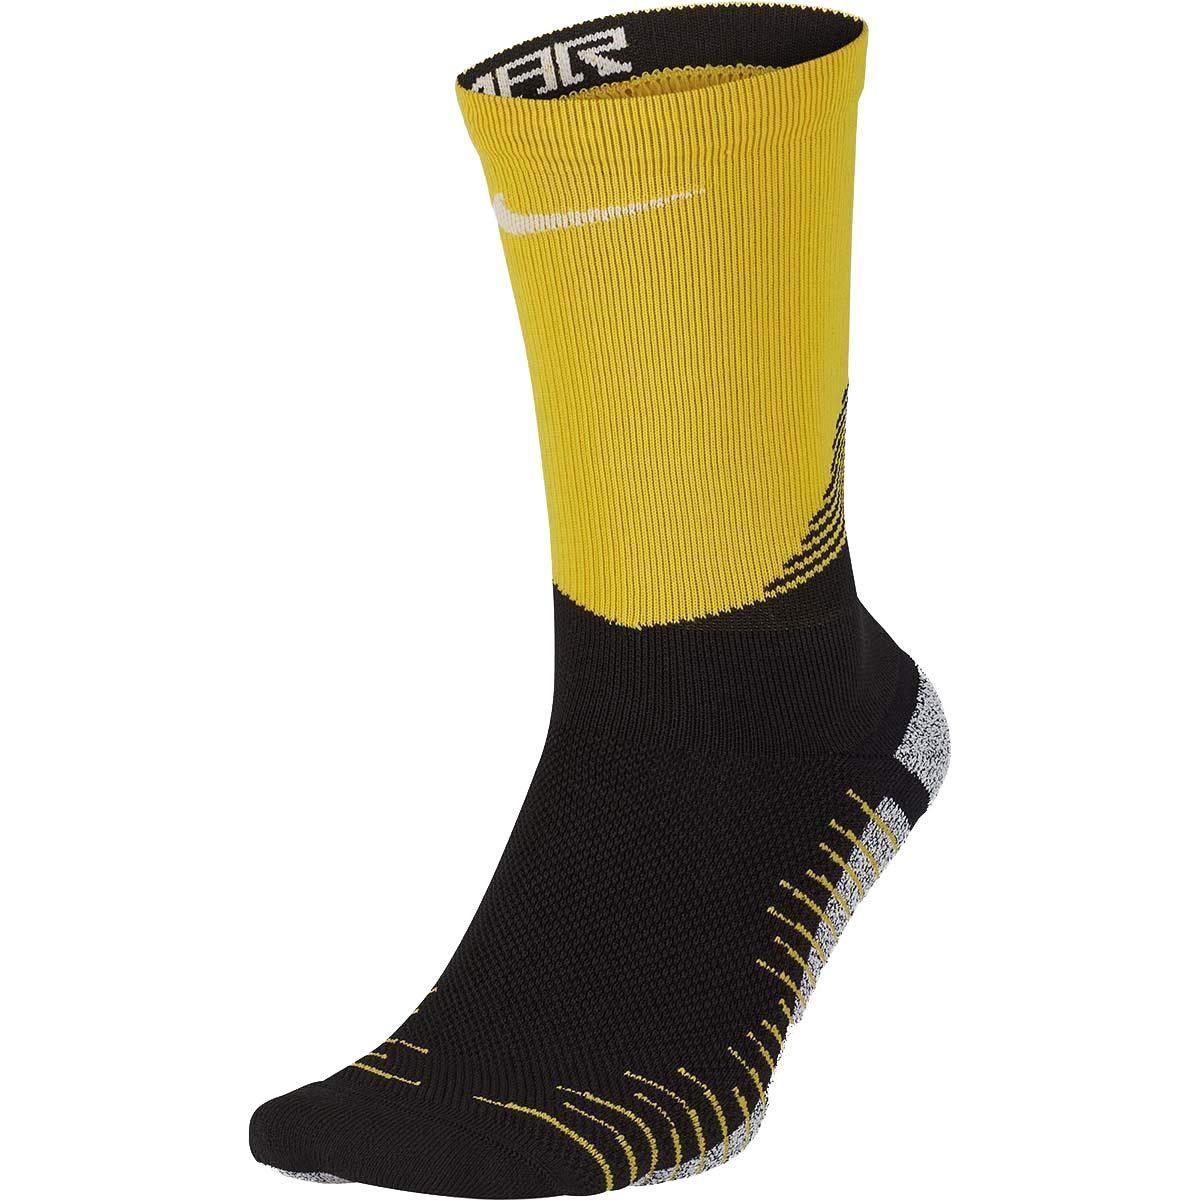 47089a884 Amazon.com: Nike Men's NikeGrip Strike Cushioned Crew Soccer Socks  (10-11.5, Yellow(SX7801-010)/Black/White): Clothing